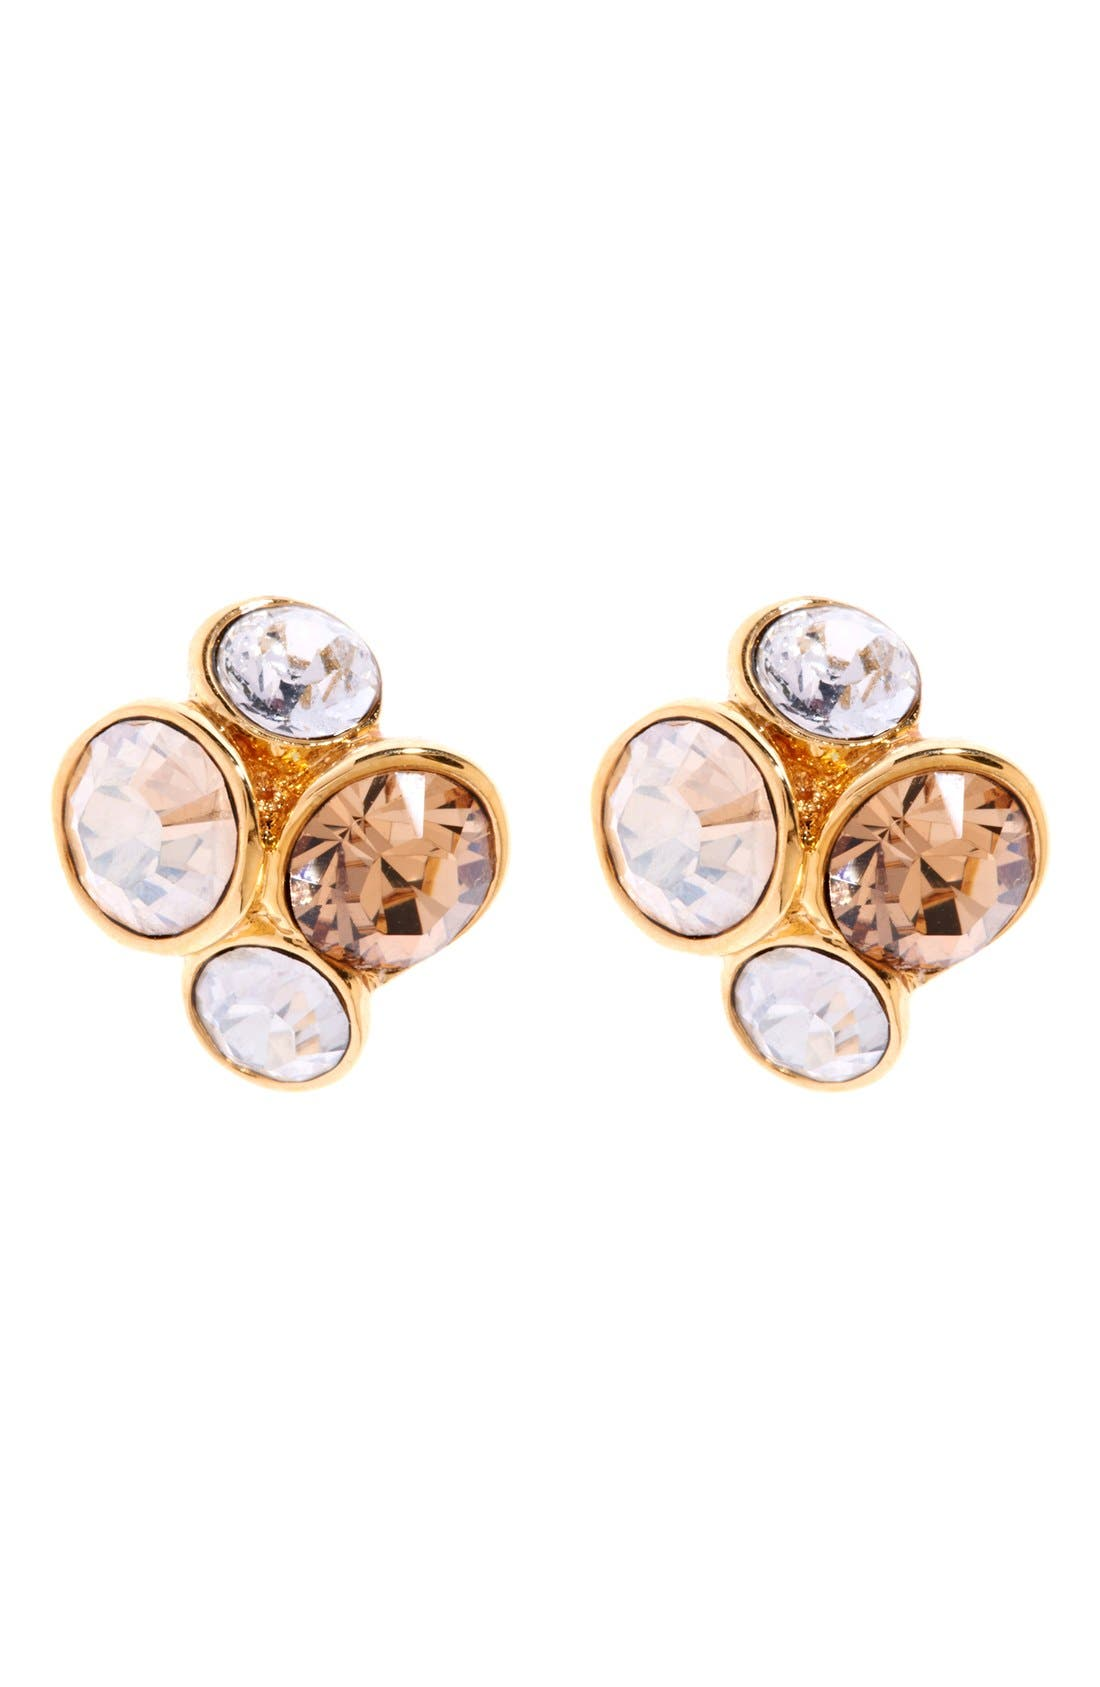 Main Image - Ted Baker London Lynda Jewel Cluster Stud Earrings